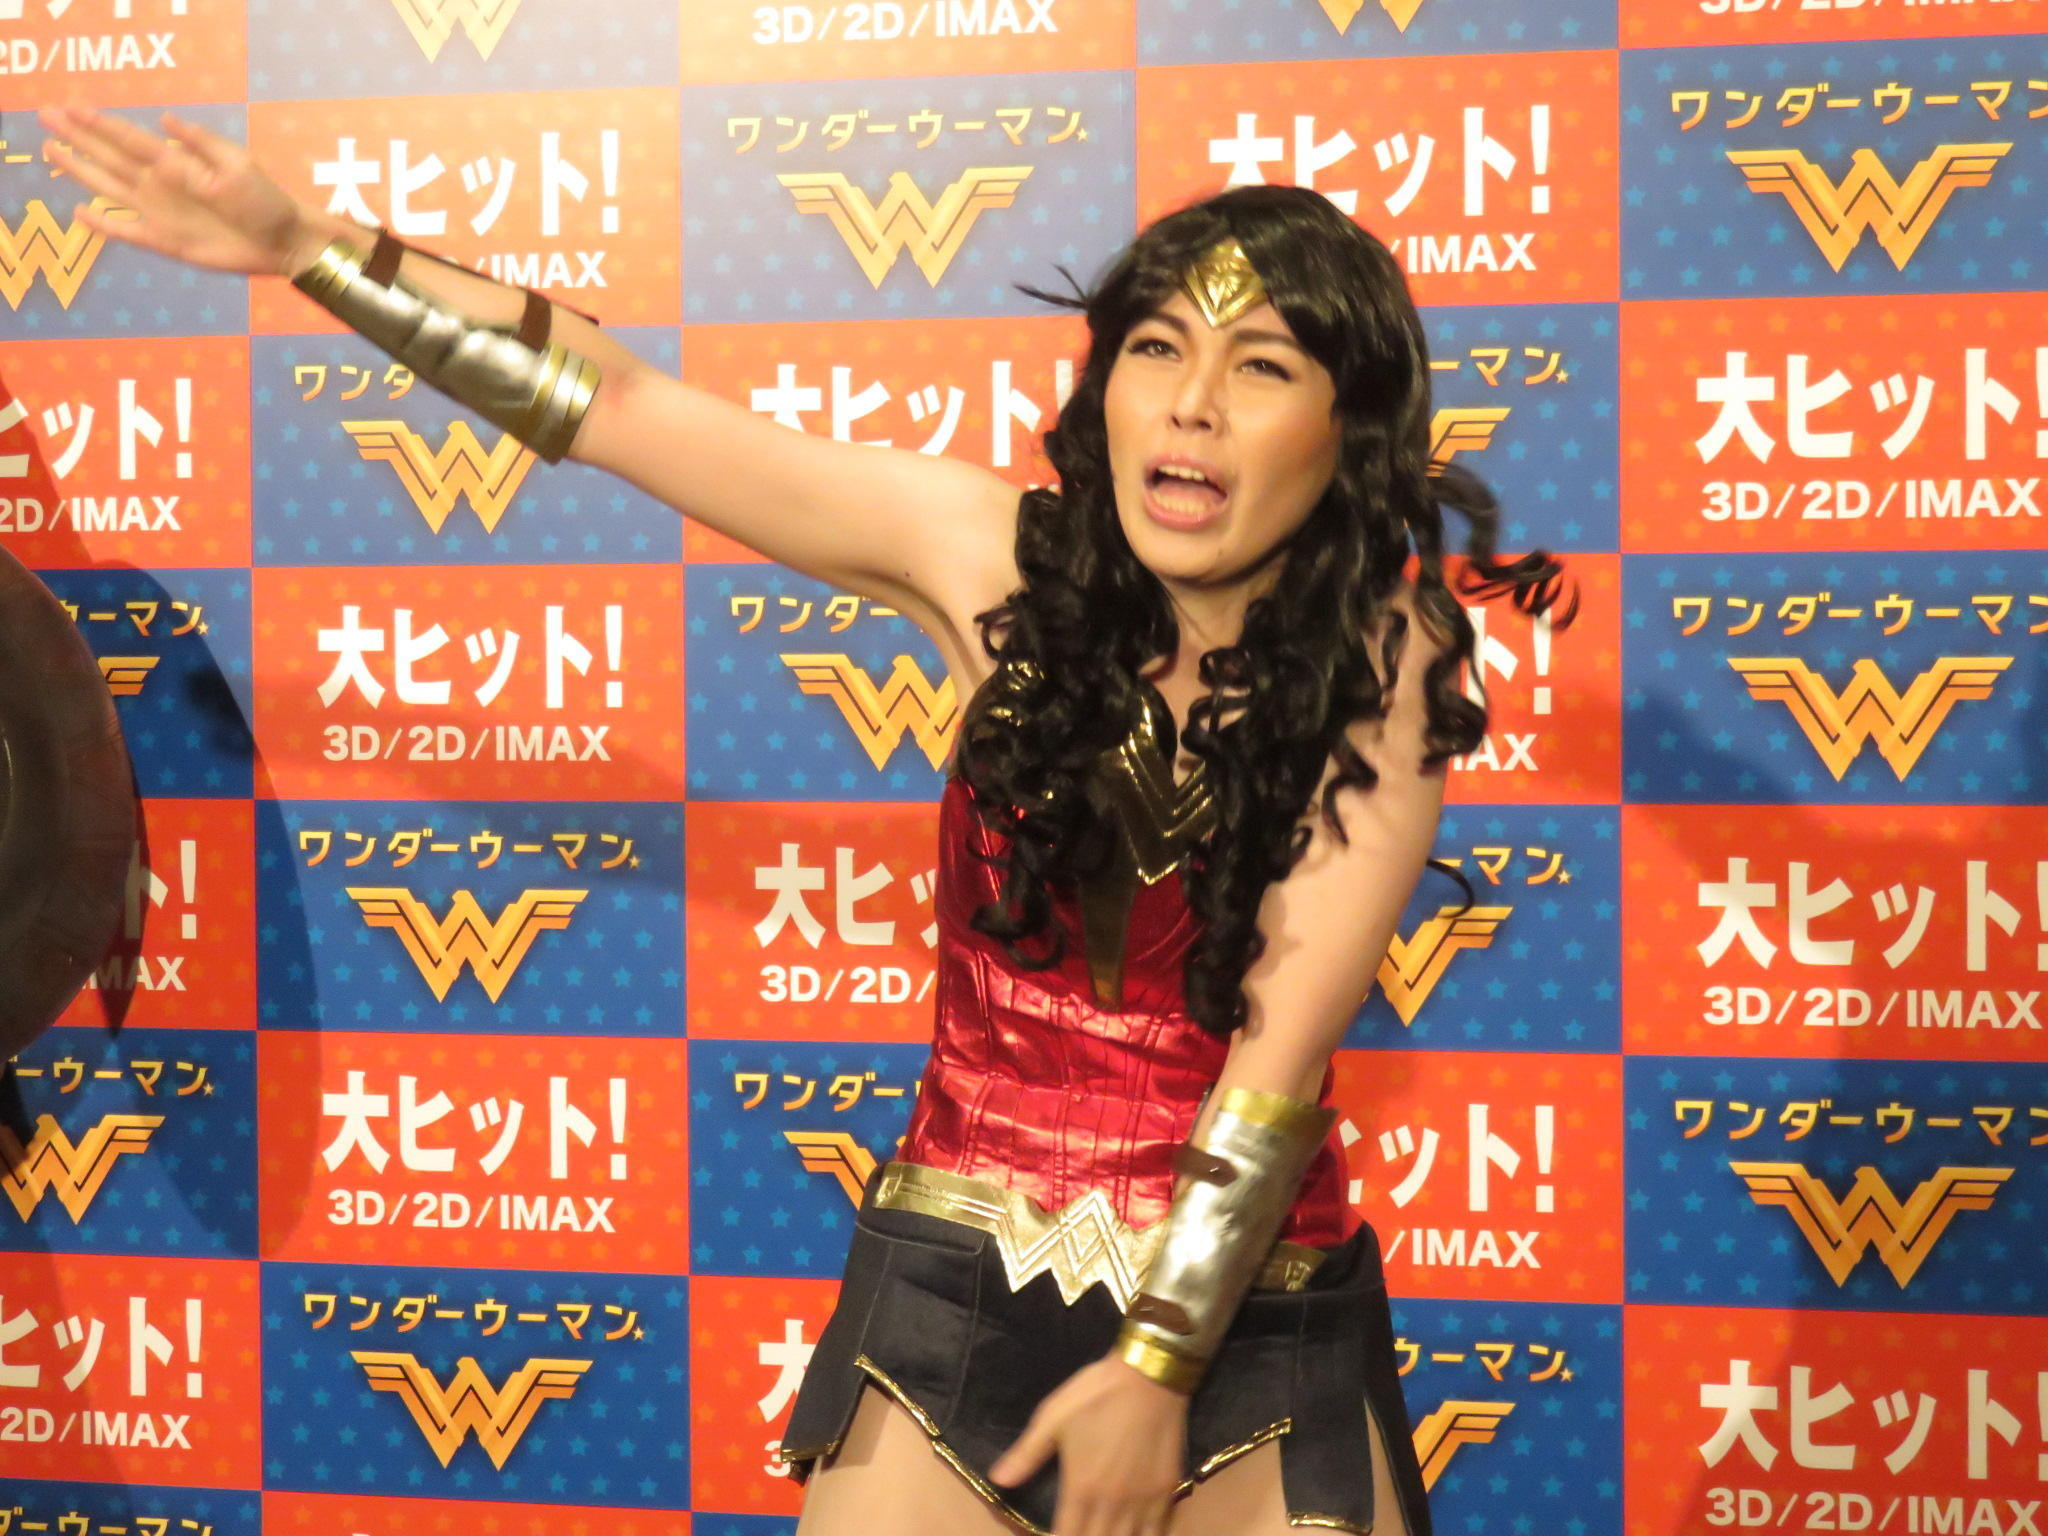 http://news.yoshimoto.co.jp/20170830184002-484b0711c0d1d97557476d871dafe04c48faad23.jpg